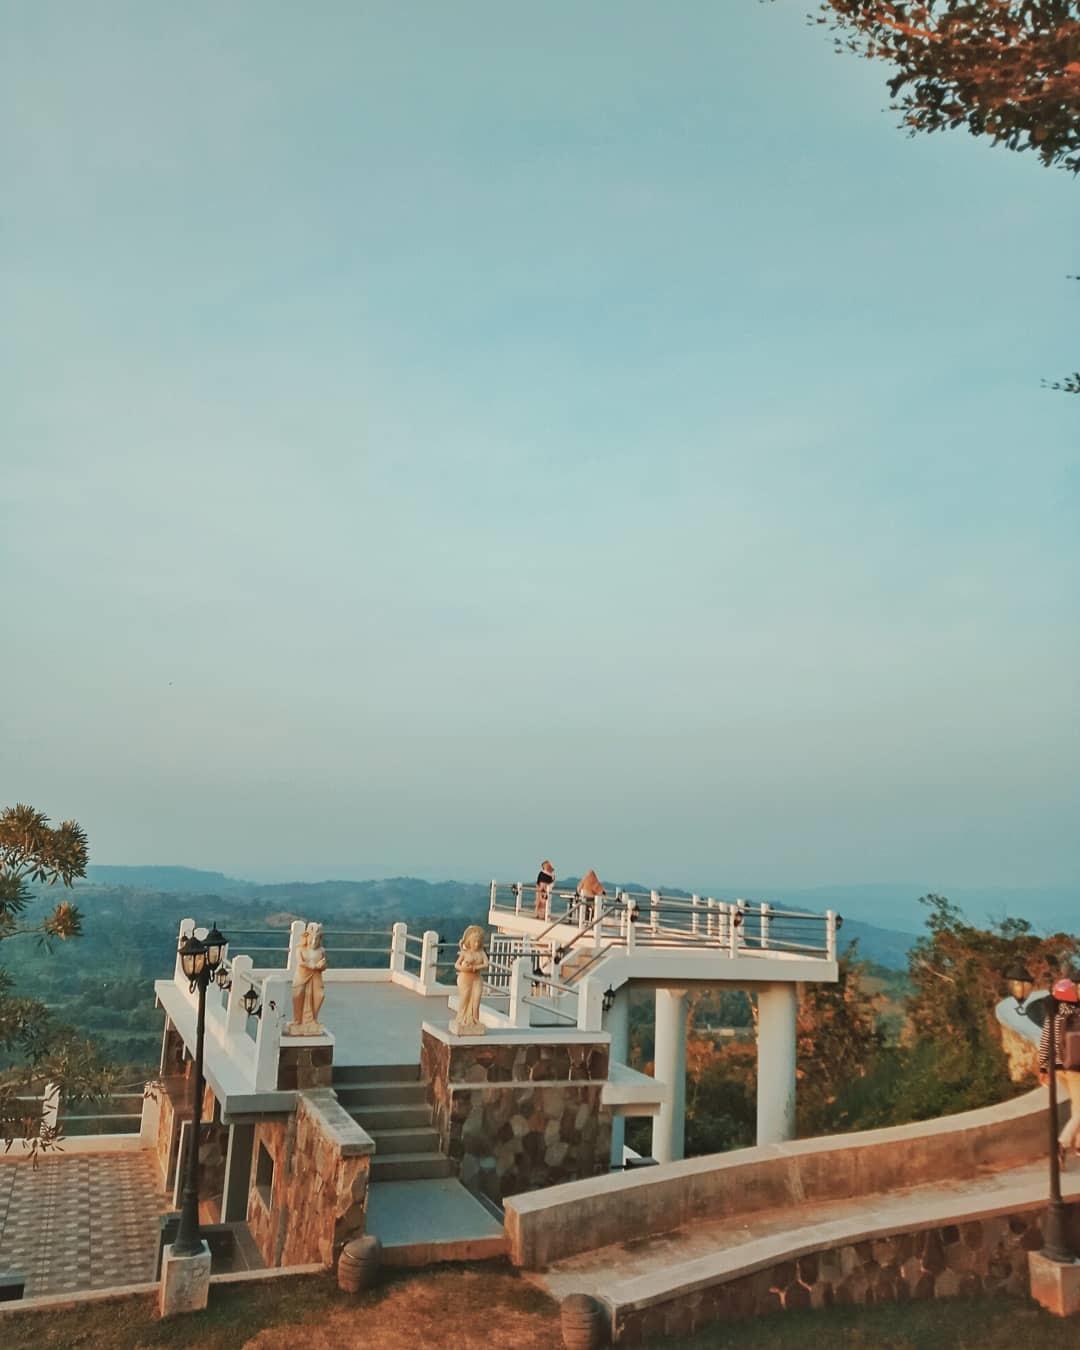 Harga hotel Hidden Valley Purwakarta